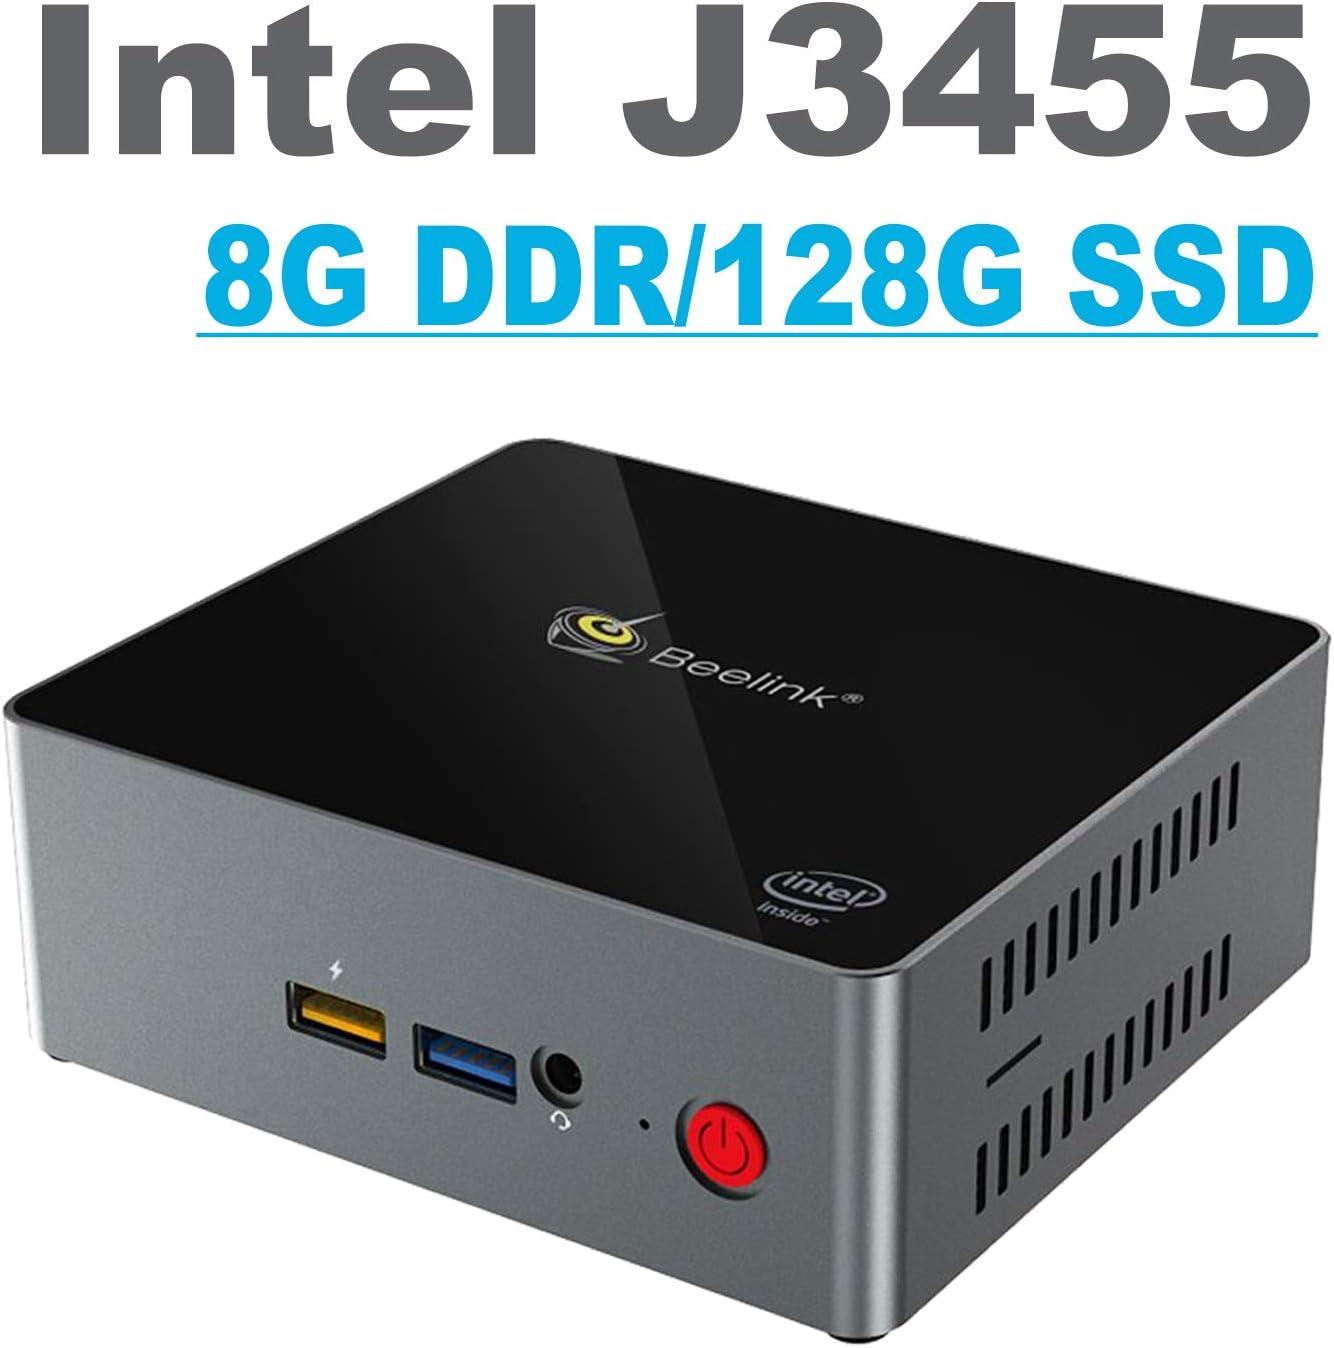 Beelink J34 Mini PC, Windows 10 64-bit Intel Celeron J3455 Processor(up to 2.3GHz) Desktop Computer,8G DDR3L 128G SSD,1000Mbps LAN / 2.4+5.8G WiFi/BT/4xUSB/2xHDMI/4K